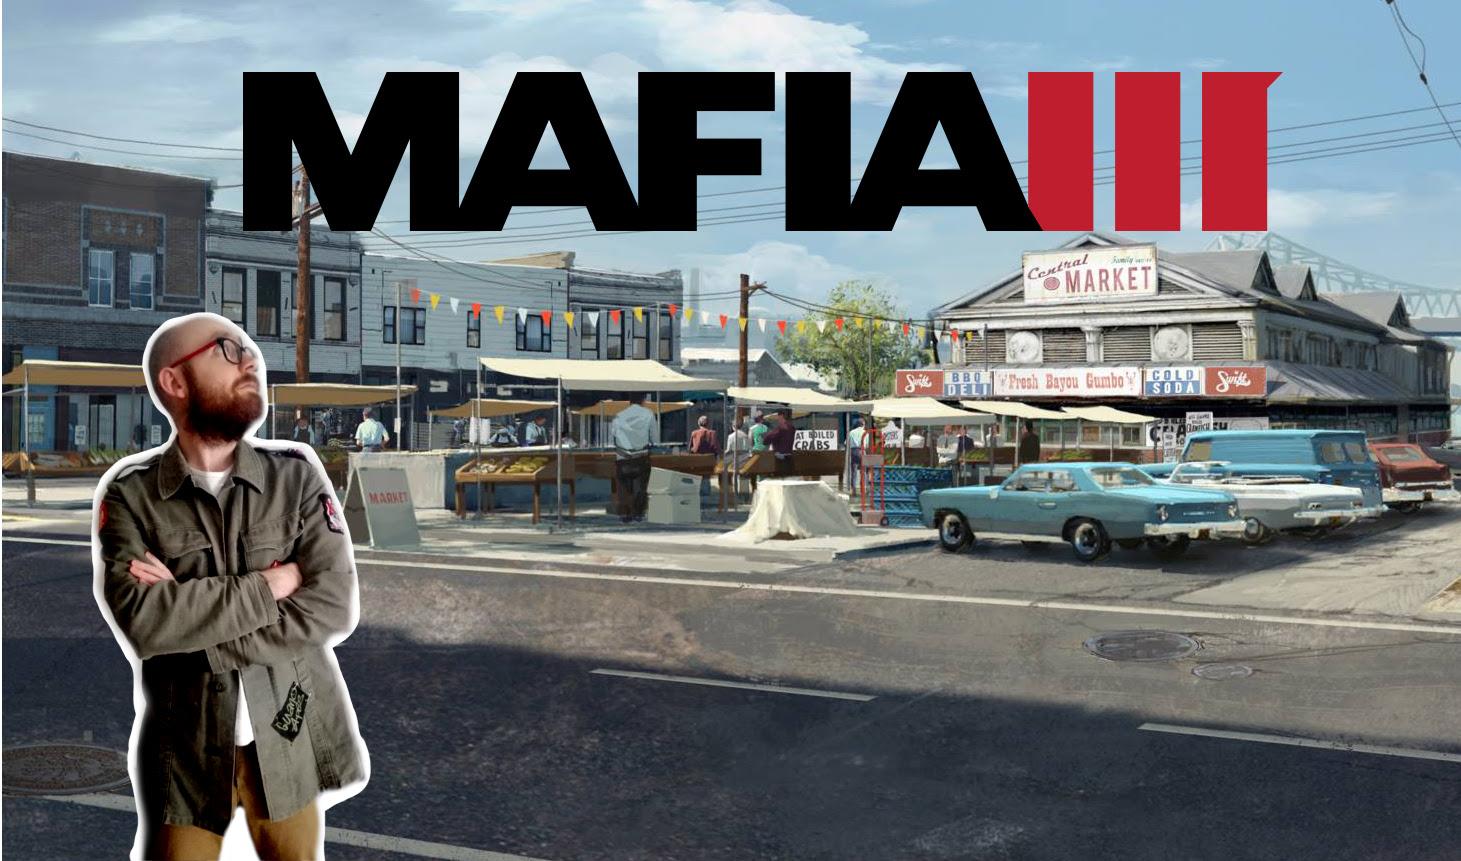 Architektura w Mafia 3 – domostwa i shotguny Luizjany